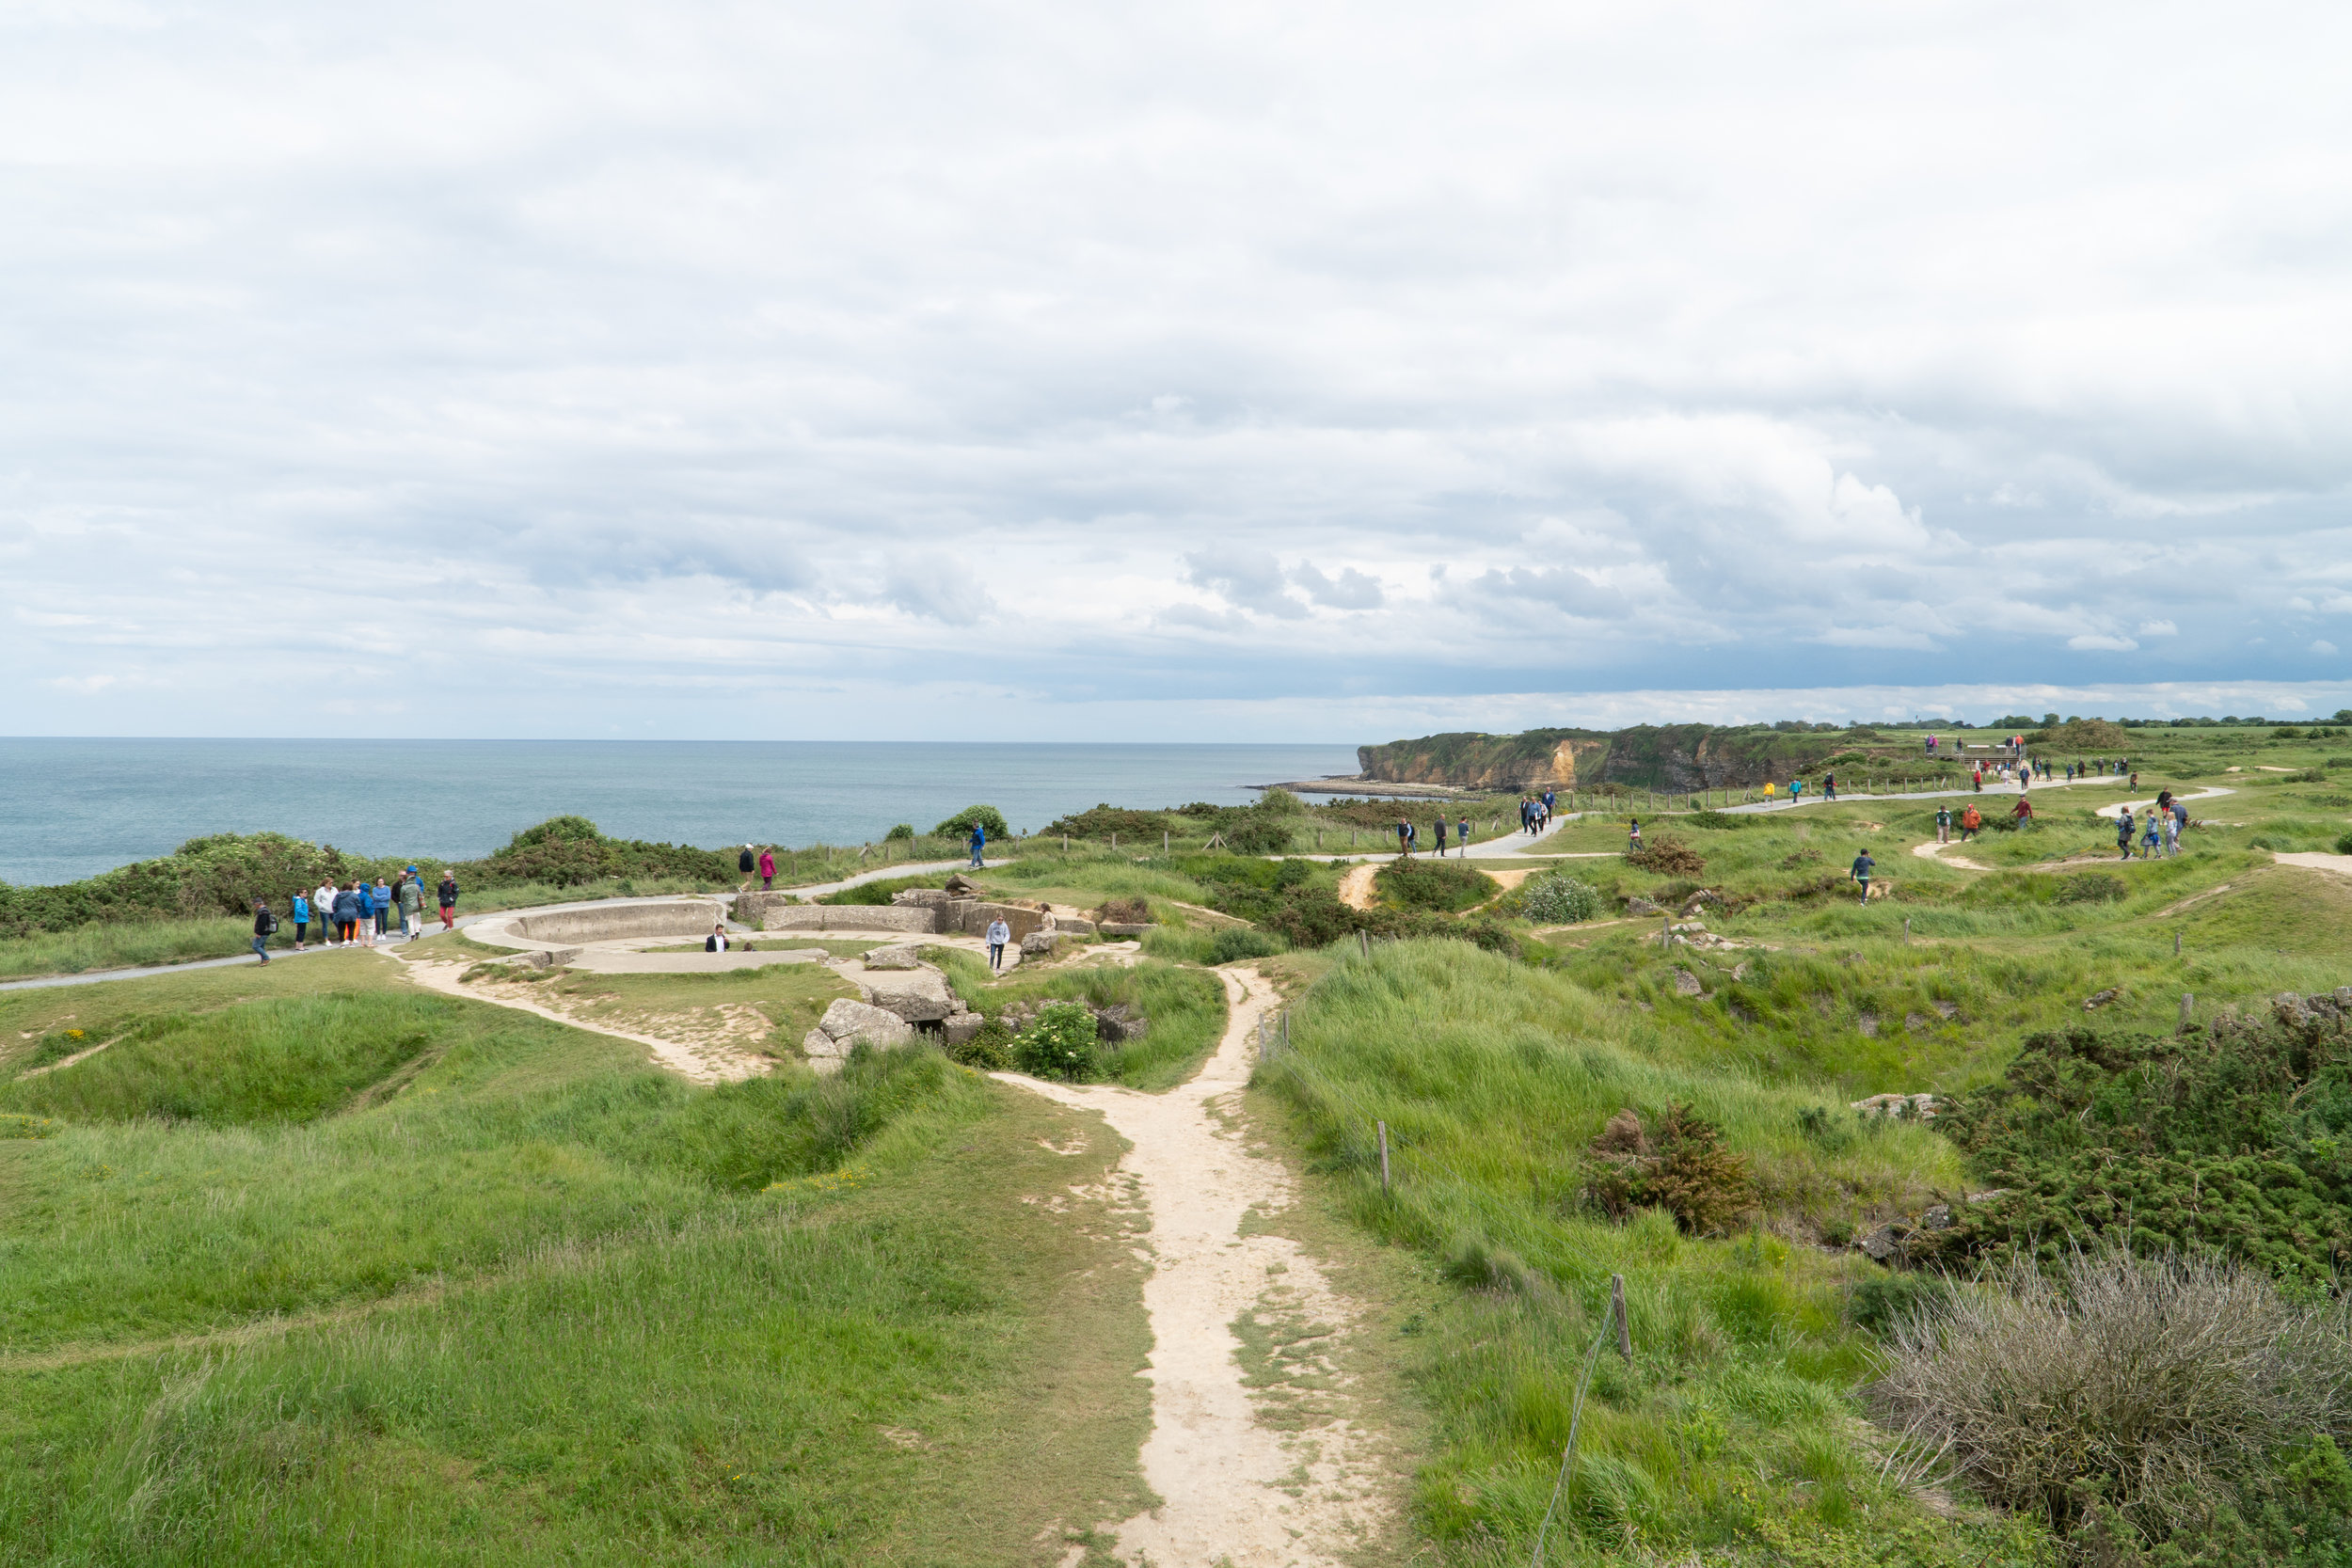 2019_Normandy-105.JPG